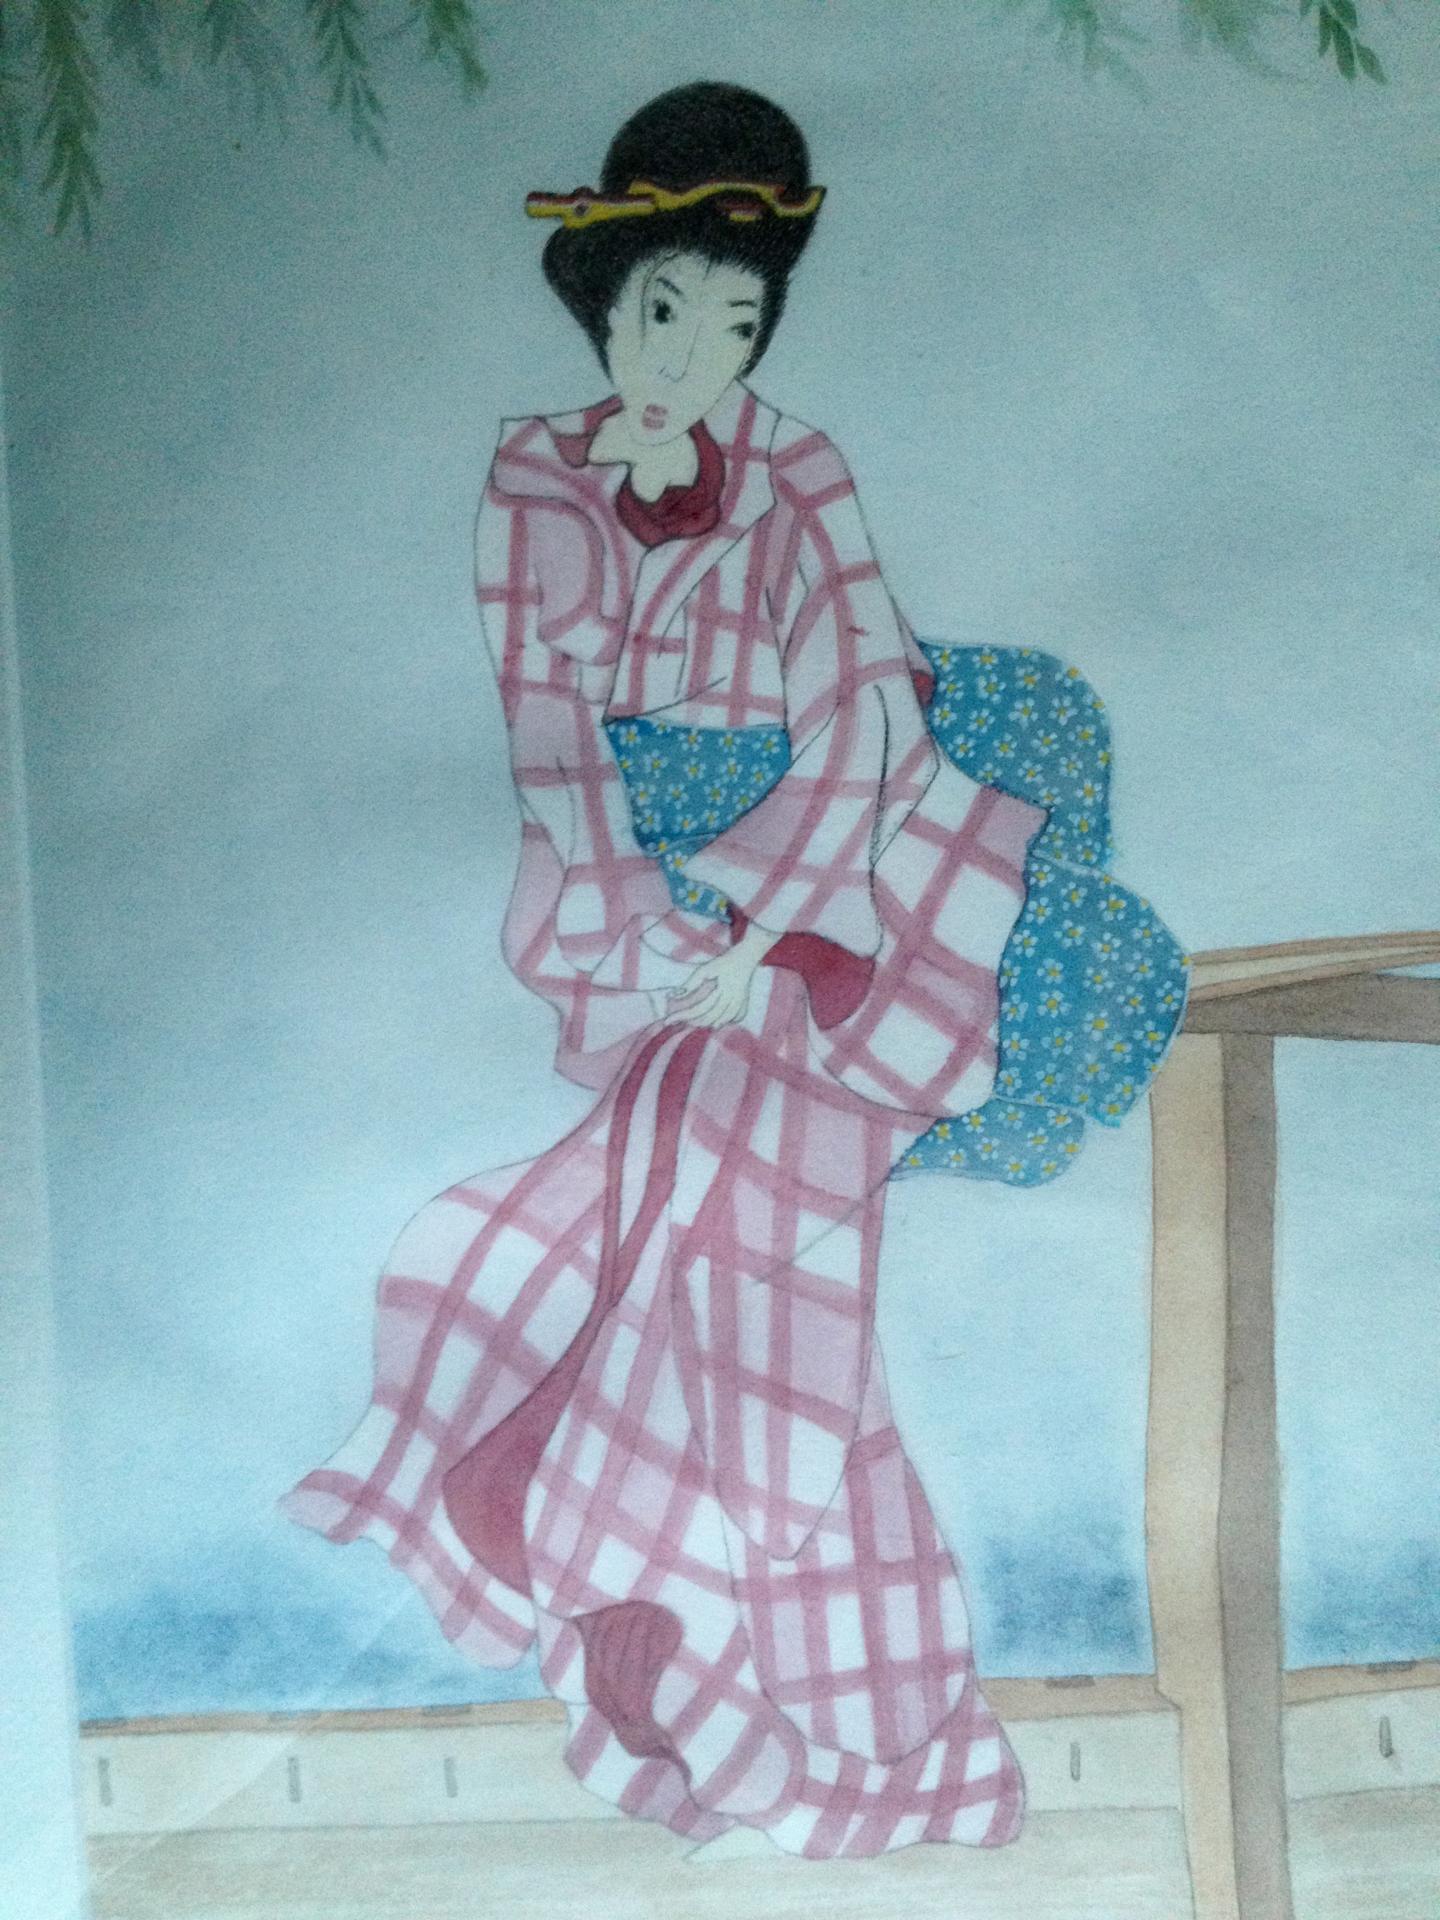 Le charme de la geisha Karima Desmazieres